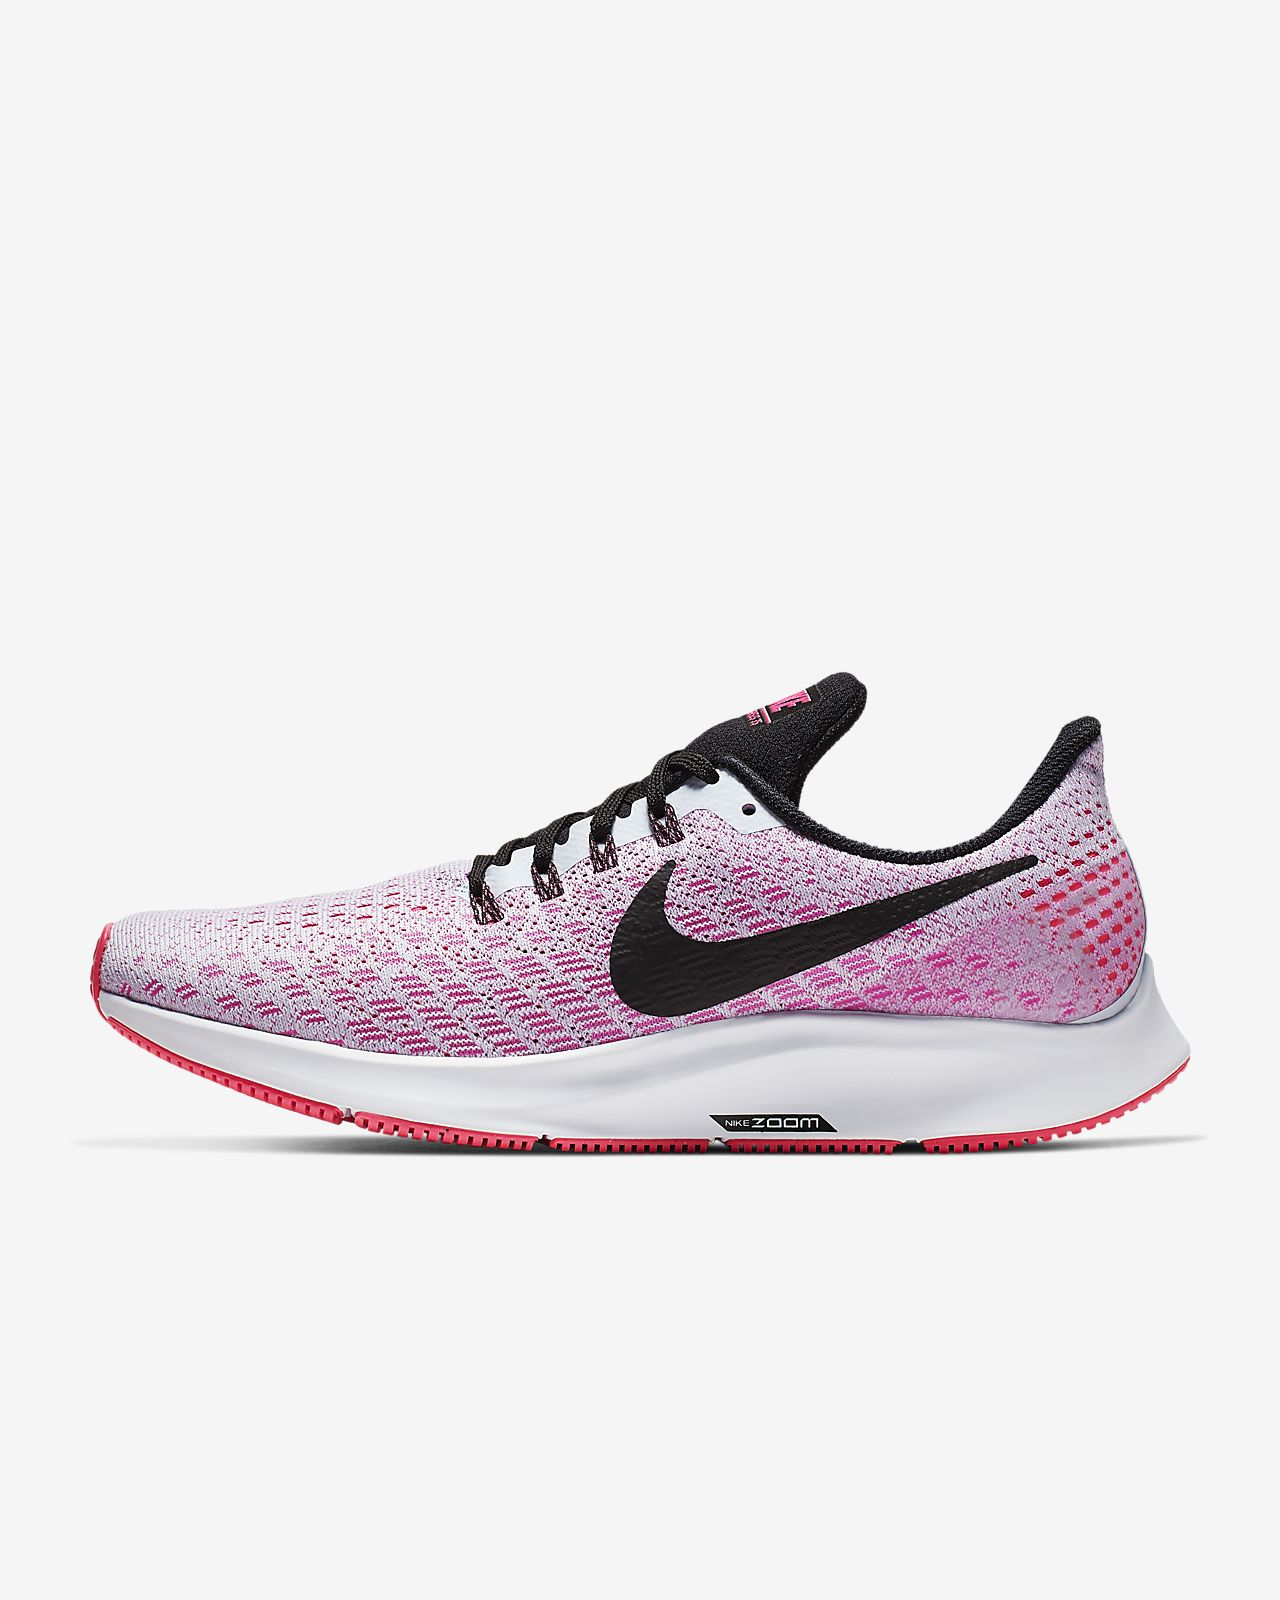 b8f7fb6e31803 Calzado de running para mujer Nike Air Zoom Pegasus 35. Nike.com CL